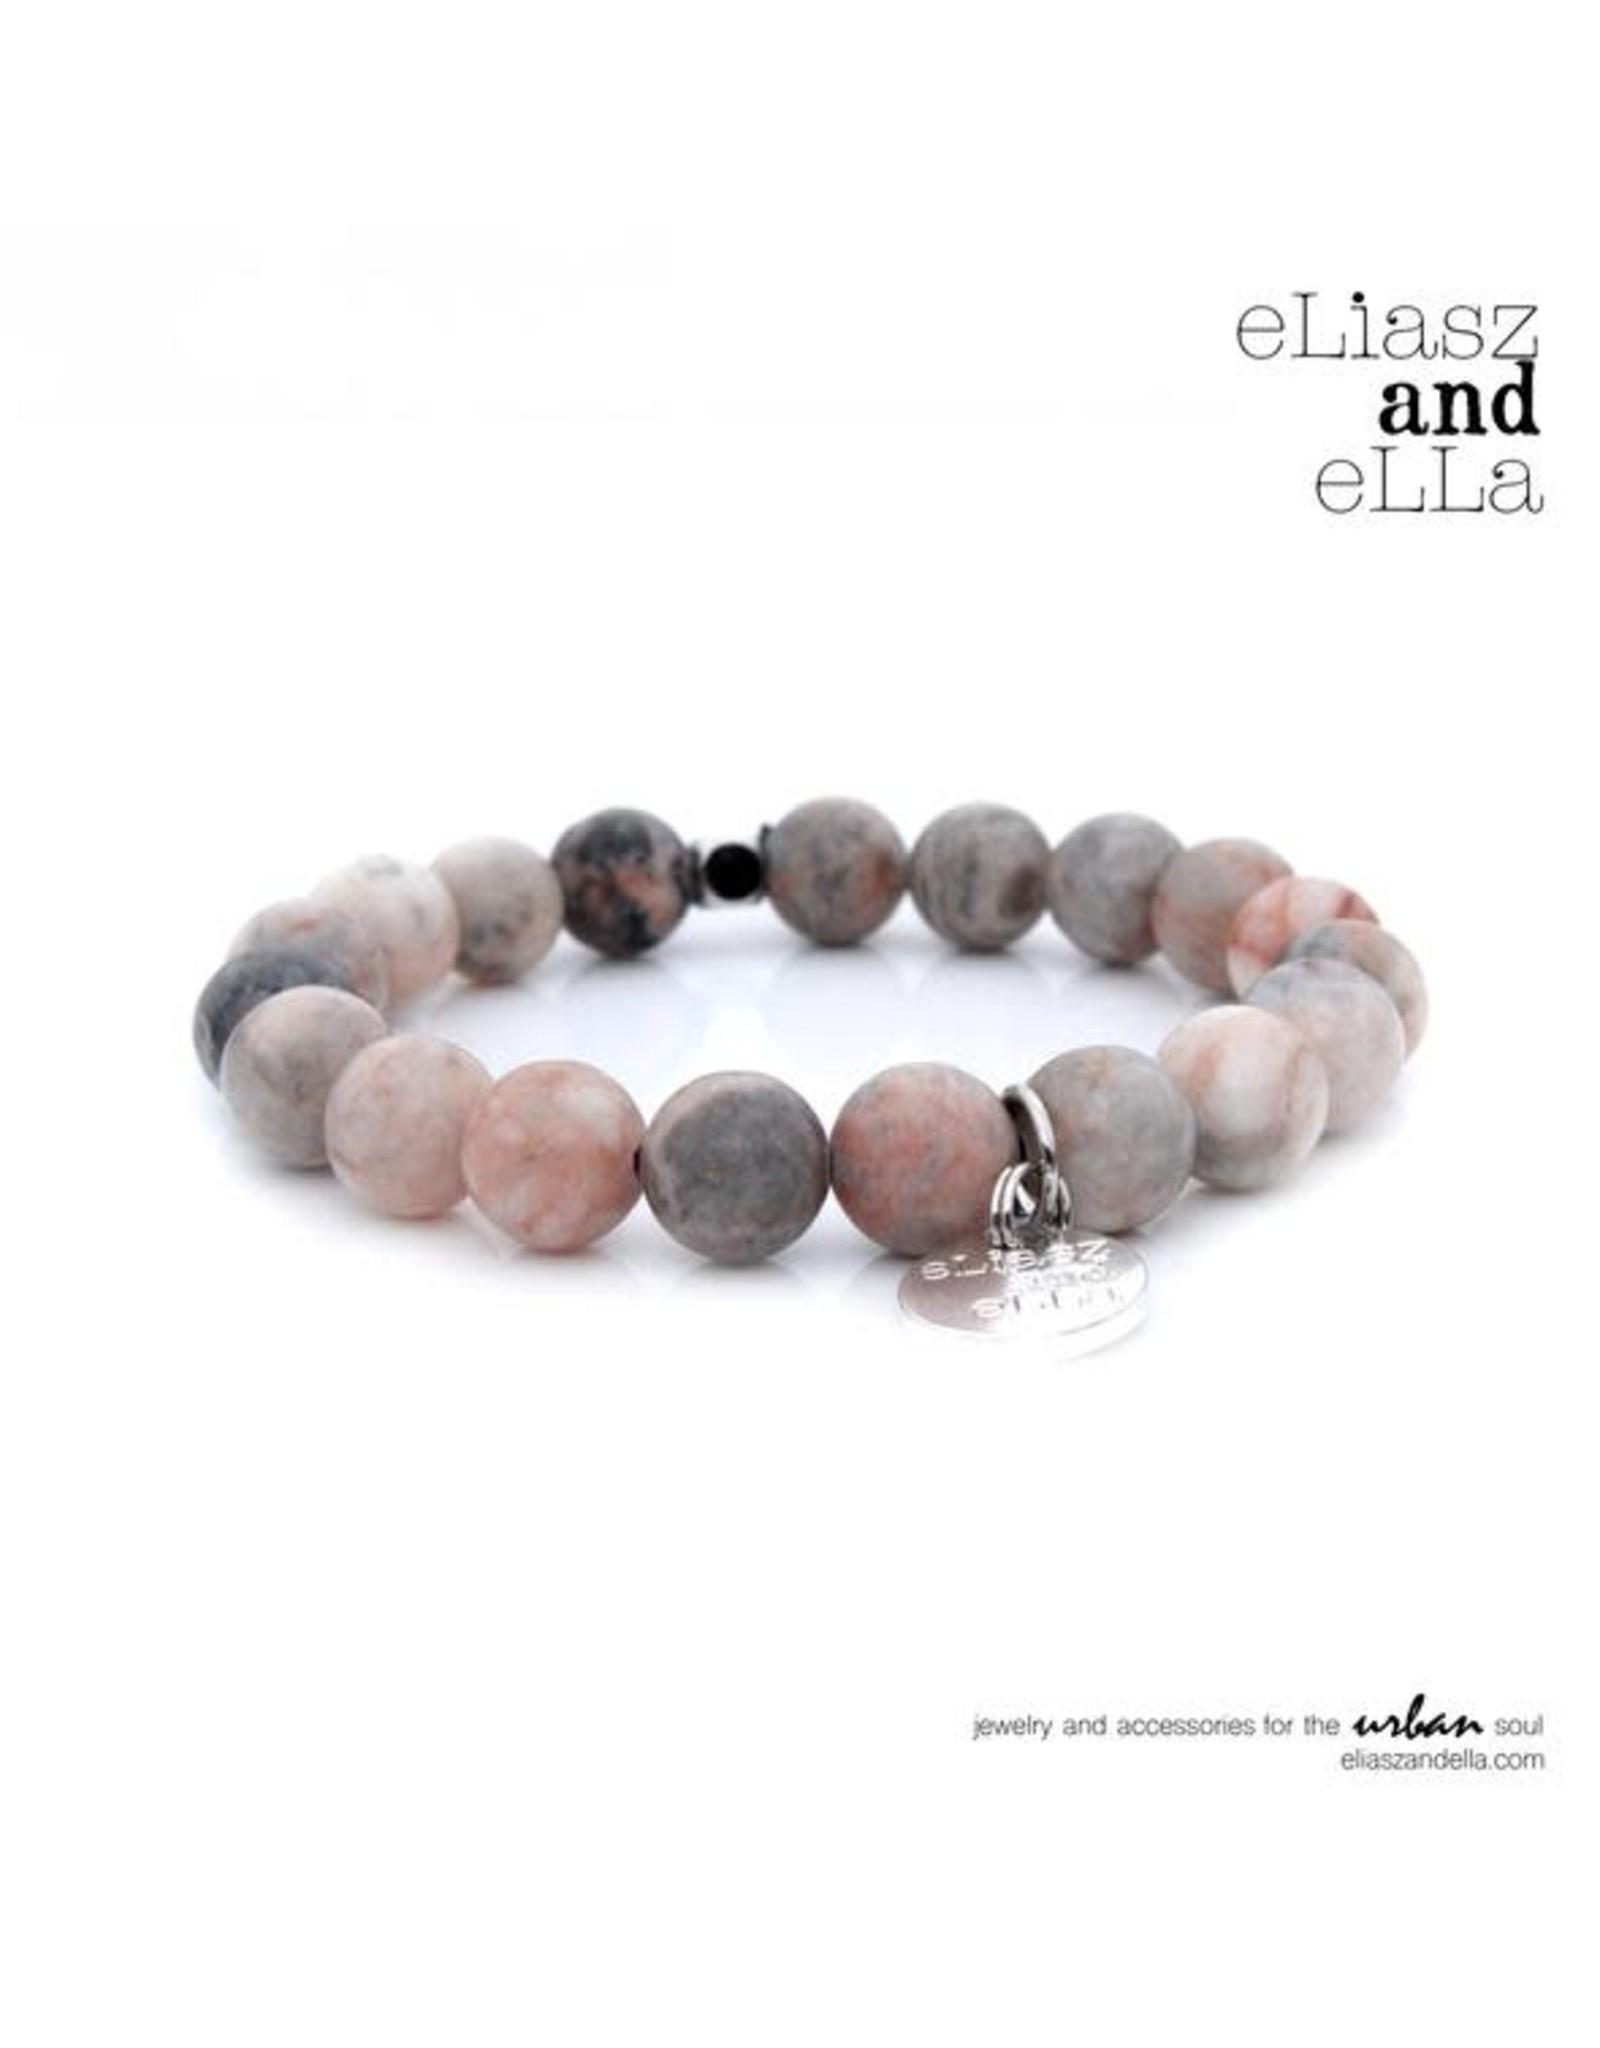 "eLiasz and eLLa ""Bliss"" Stone Bangin' Bracelet"